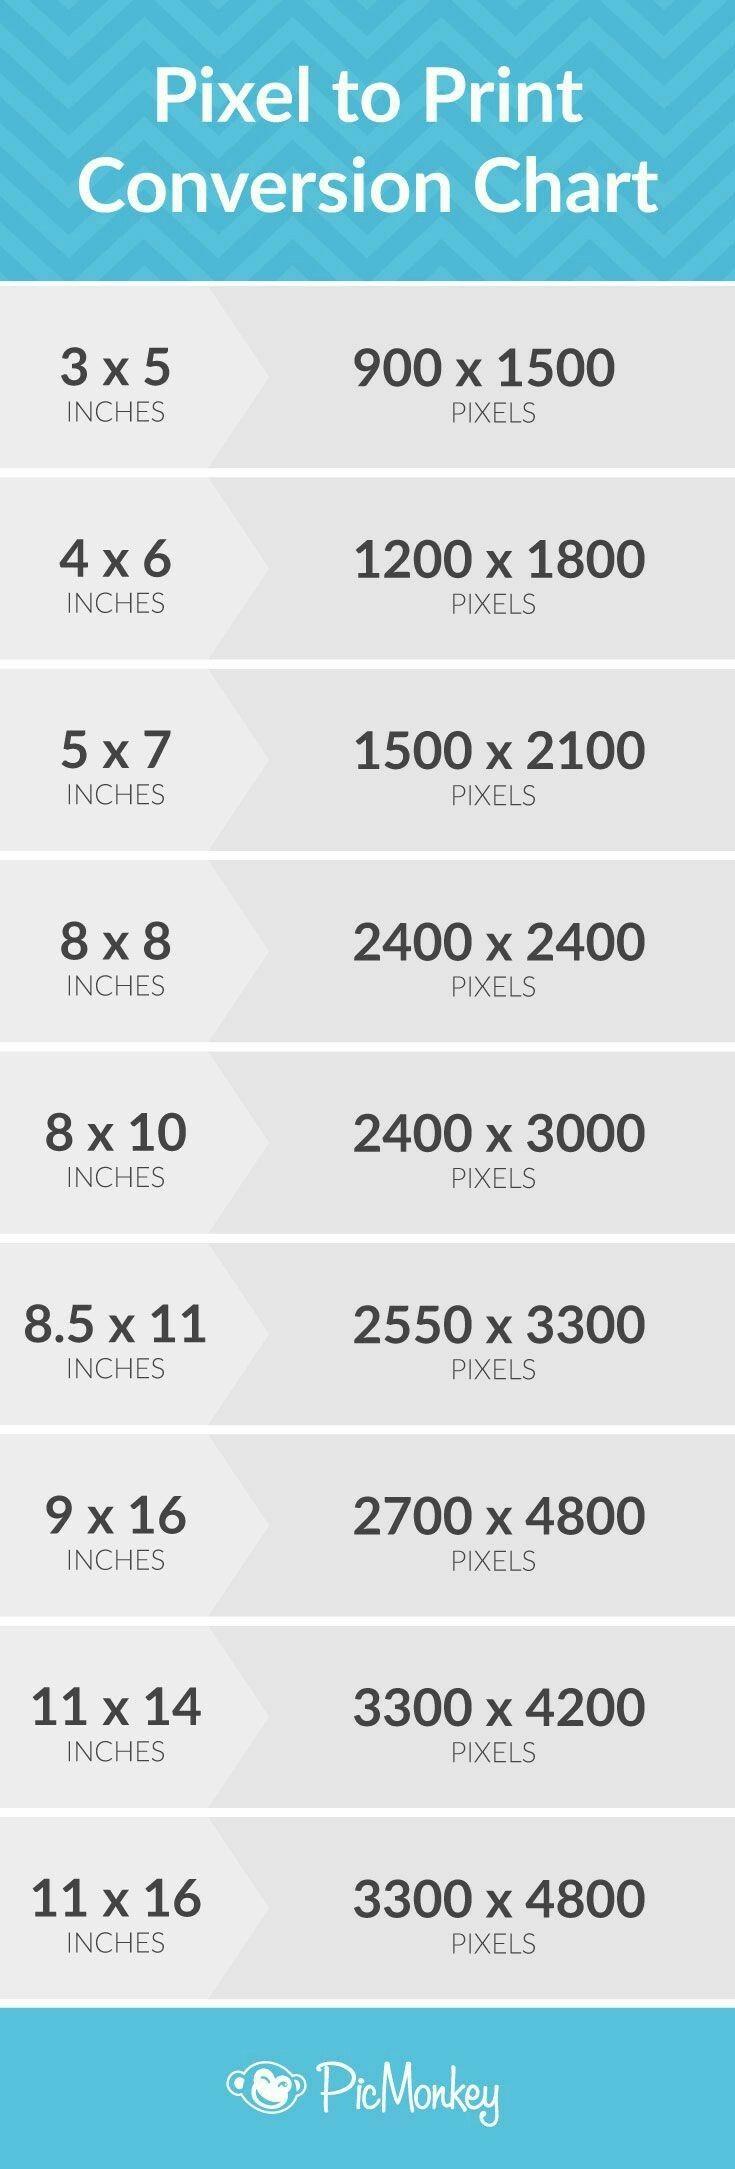 Pixel to print conversion chart Graphic design, print